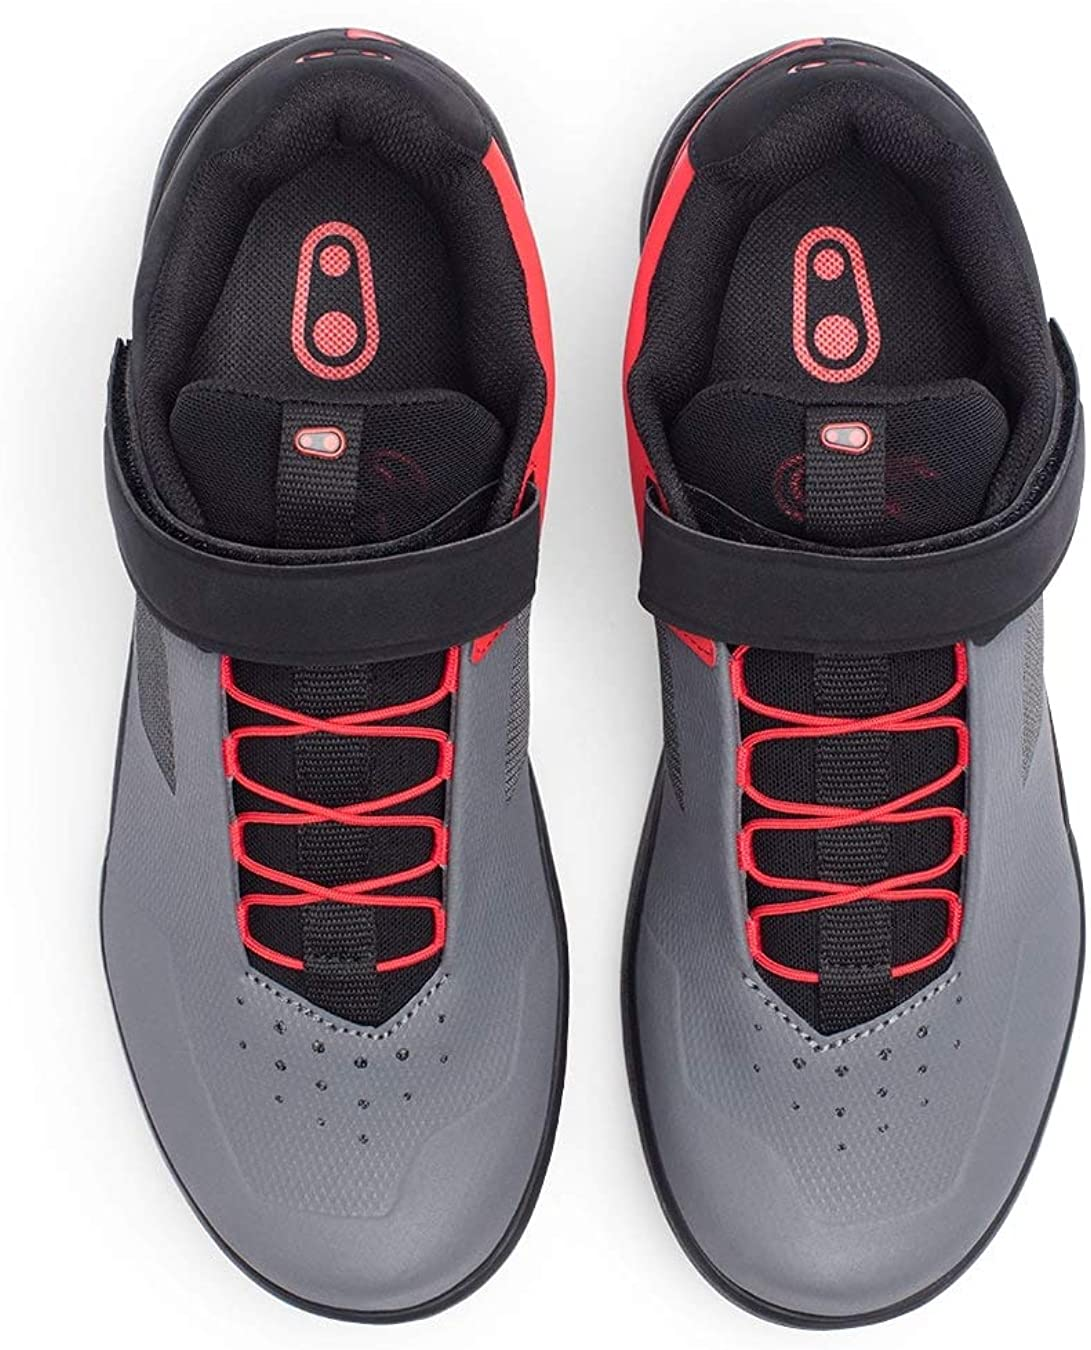 Crank Brothers Stamp Lace Men/'s Flat Shoe Black//Red//Black Size 12